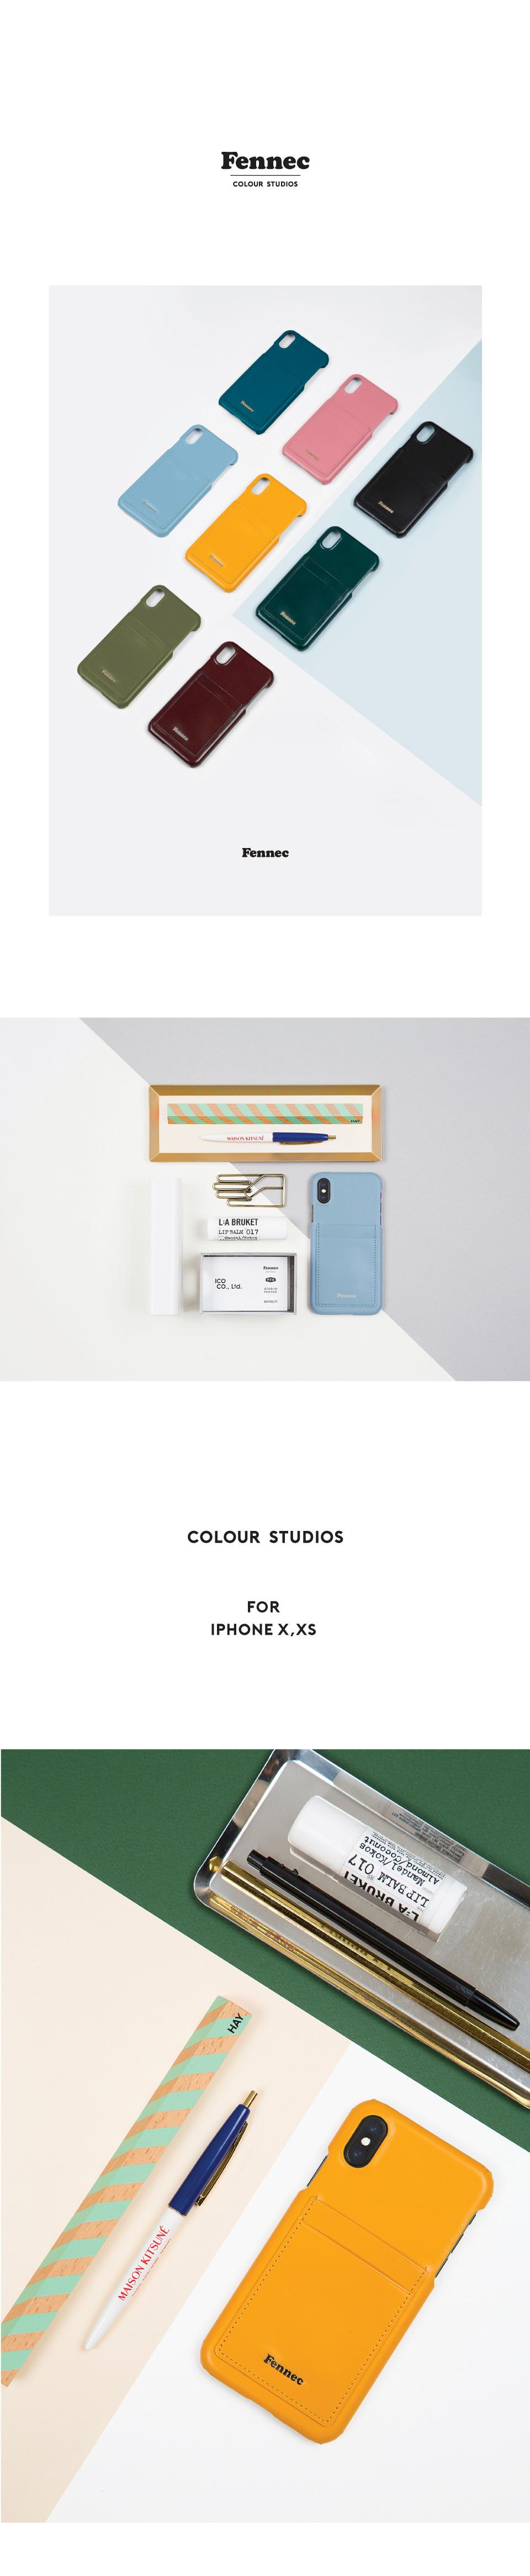 10x10-iphone-x,xs_01.jpg